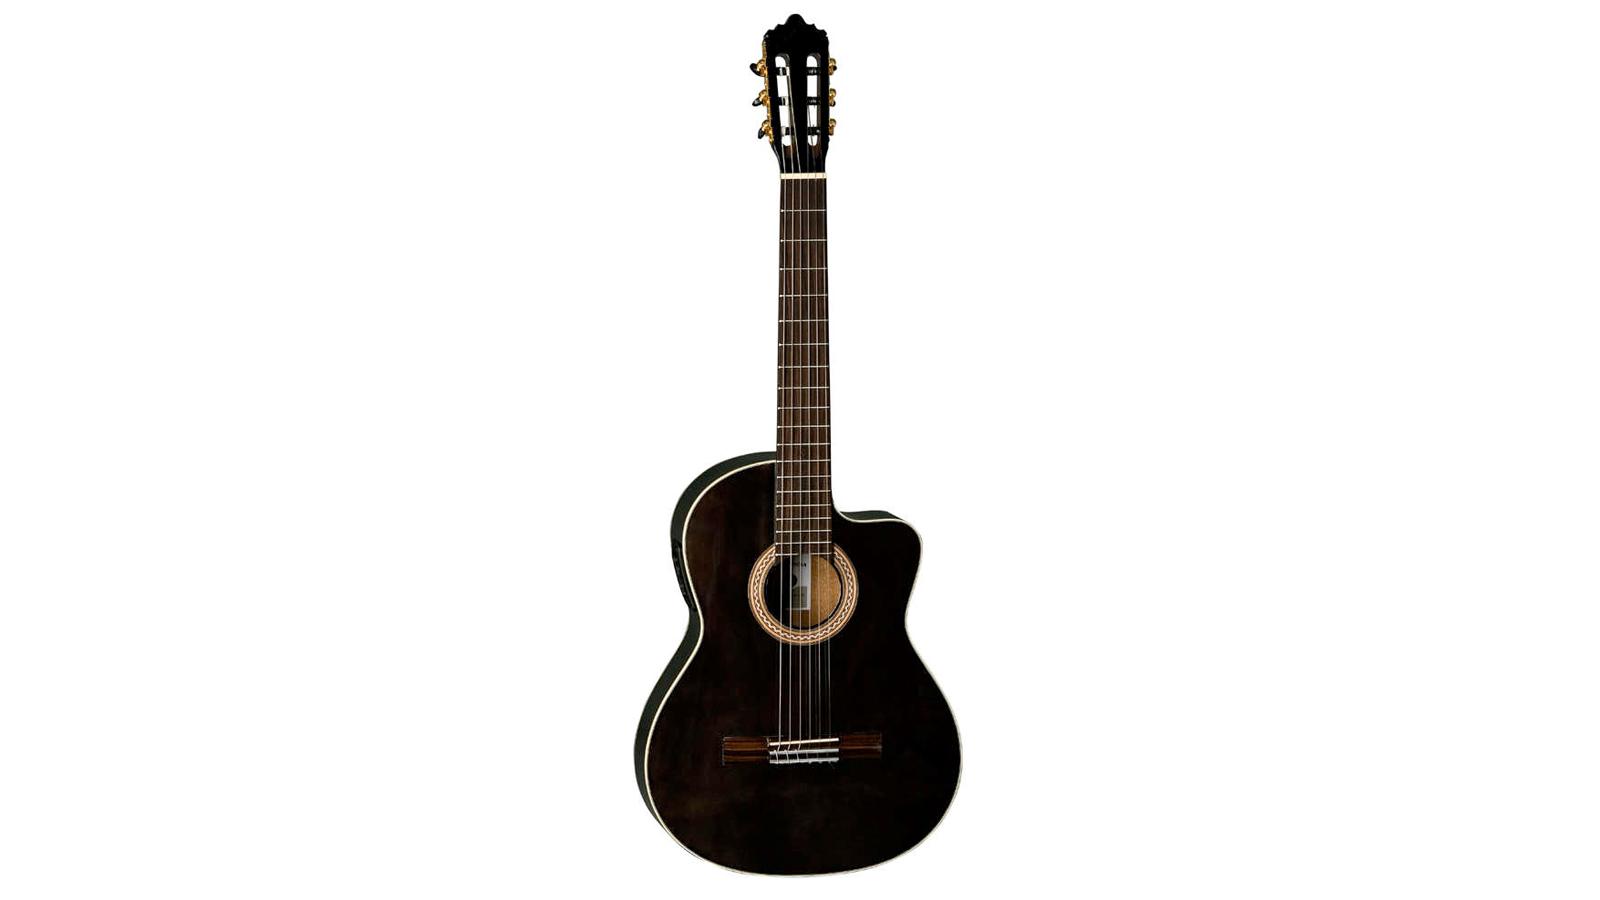 La Mancha Perla Negra CWE Konzertgitarre 4/4